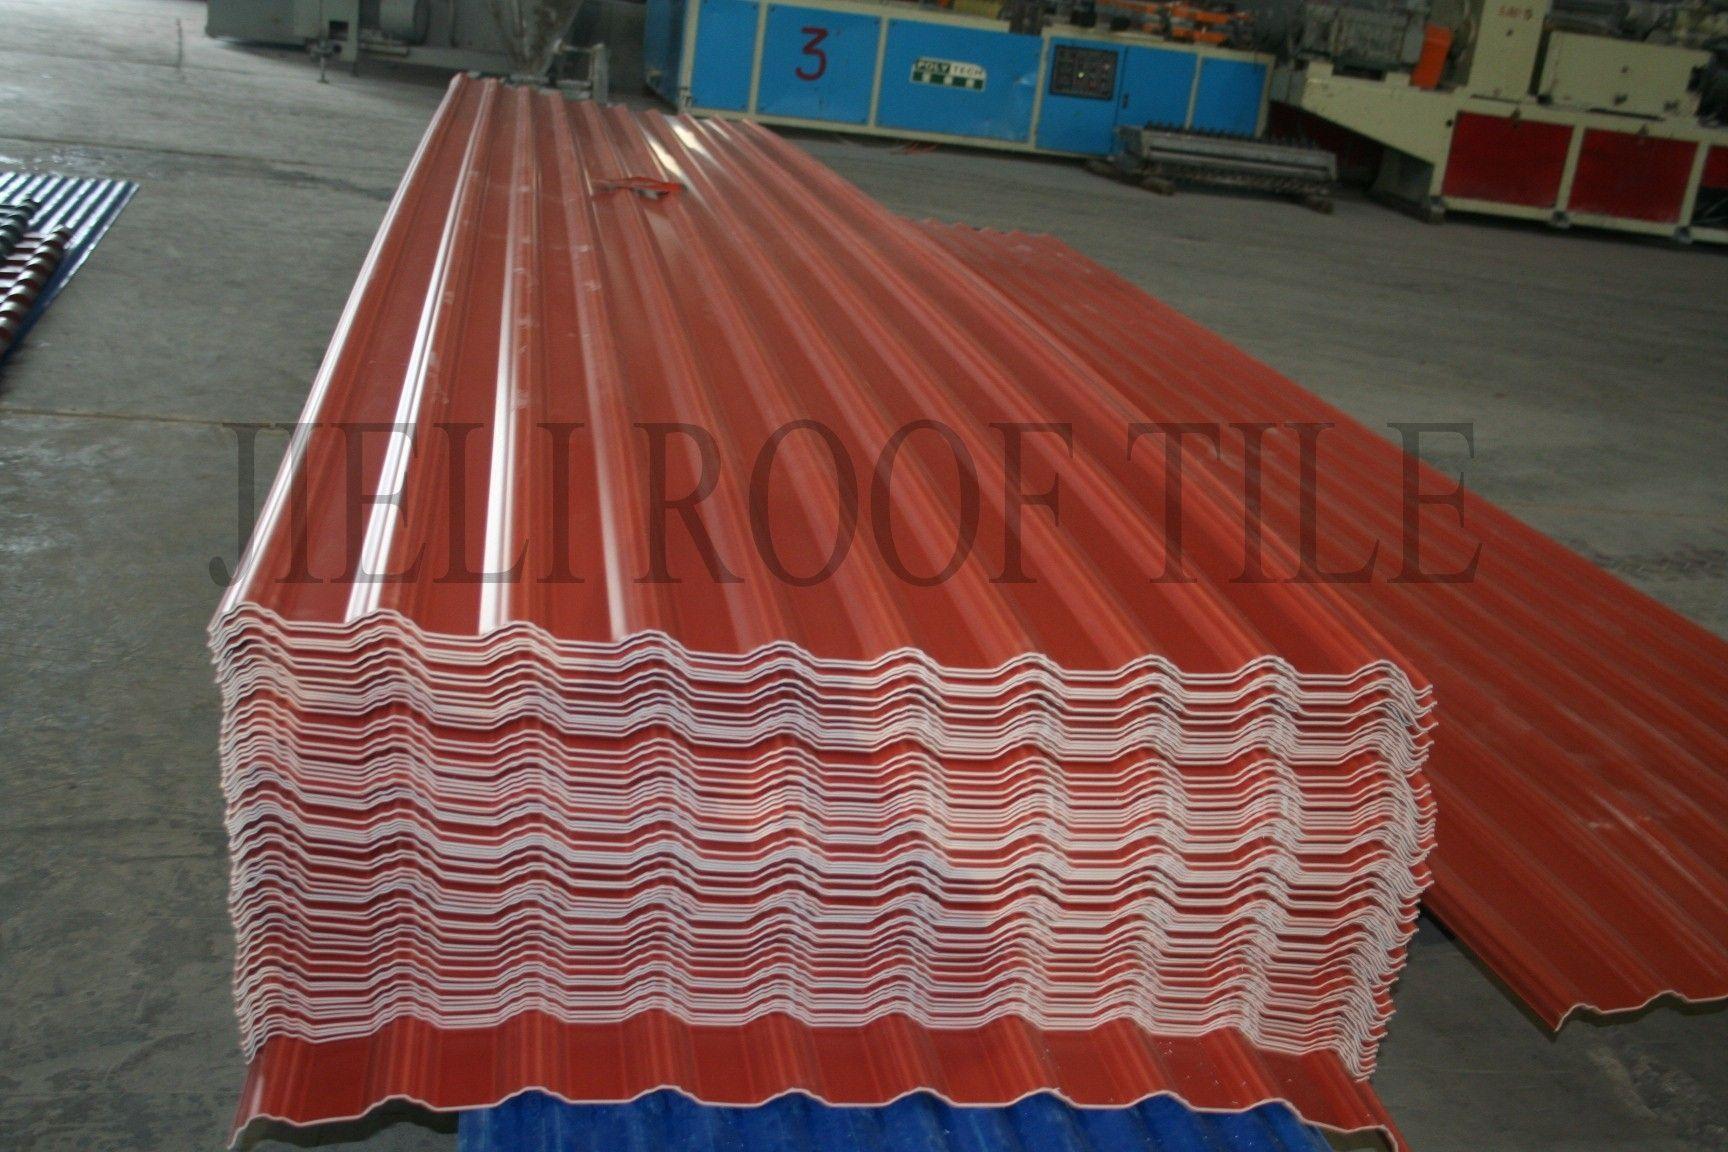 Composite Roofing Reinforced Fiberglass Roof Tile 1130 Width Laizhou Jieli Industry Co Ltd Corrugated